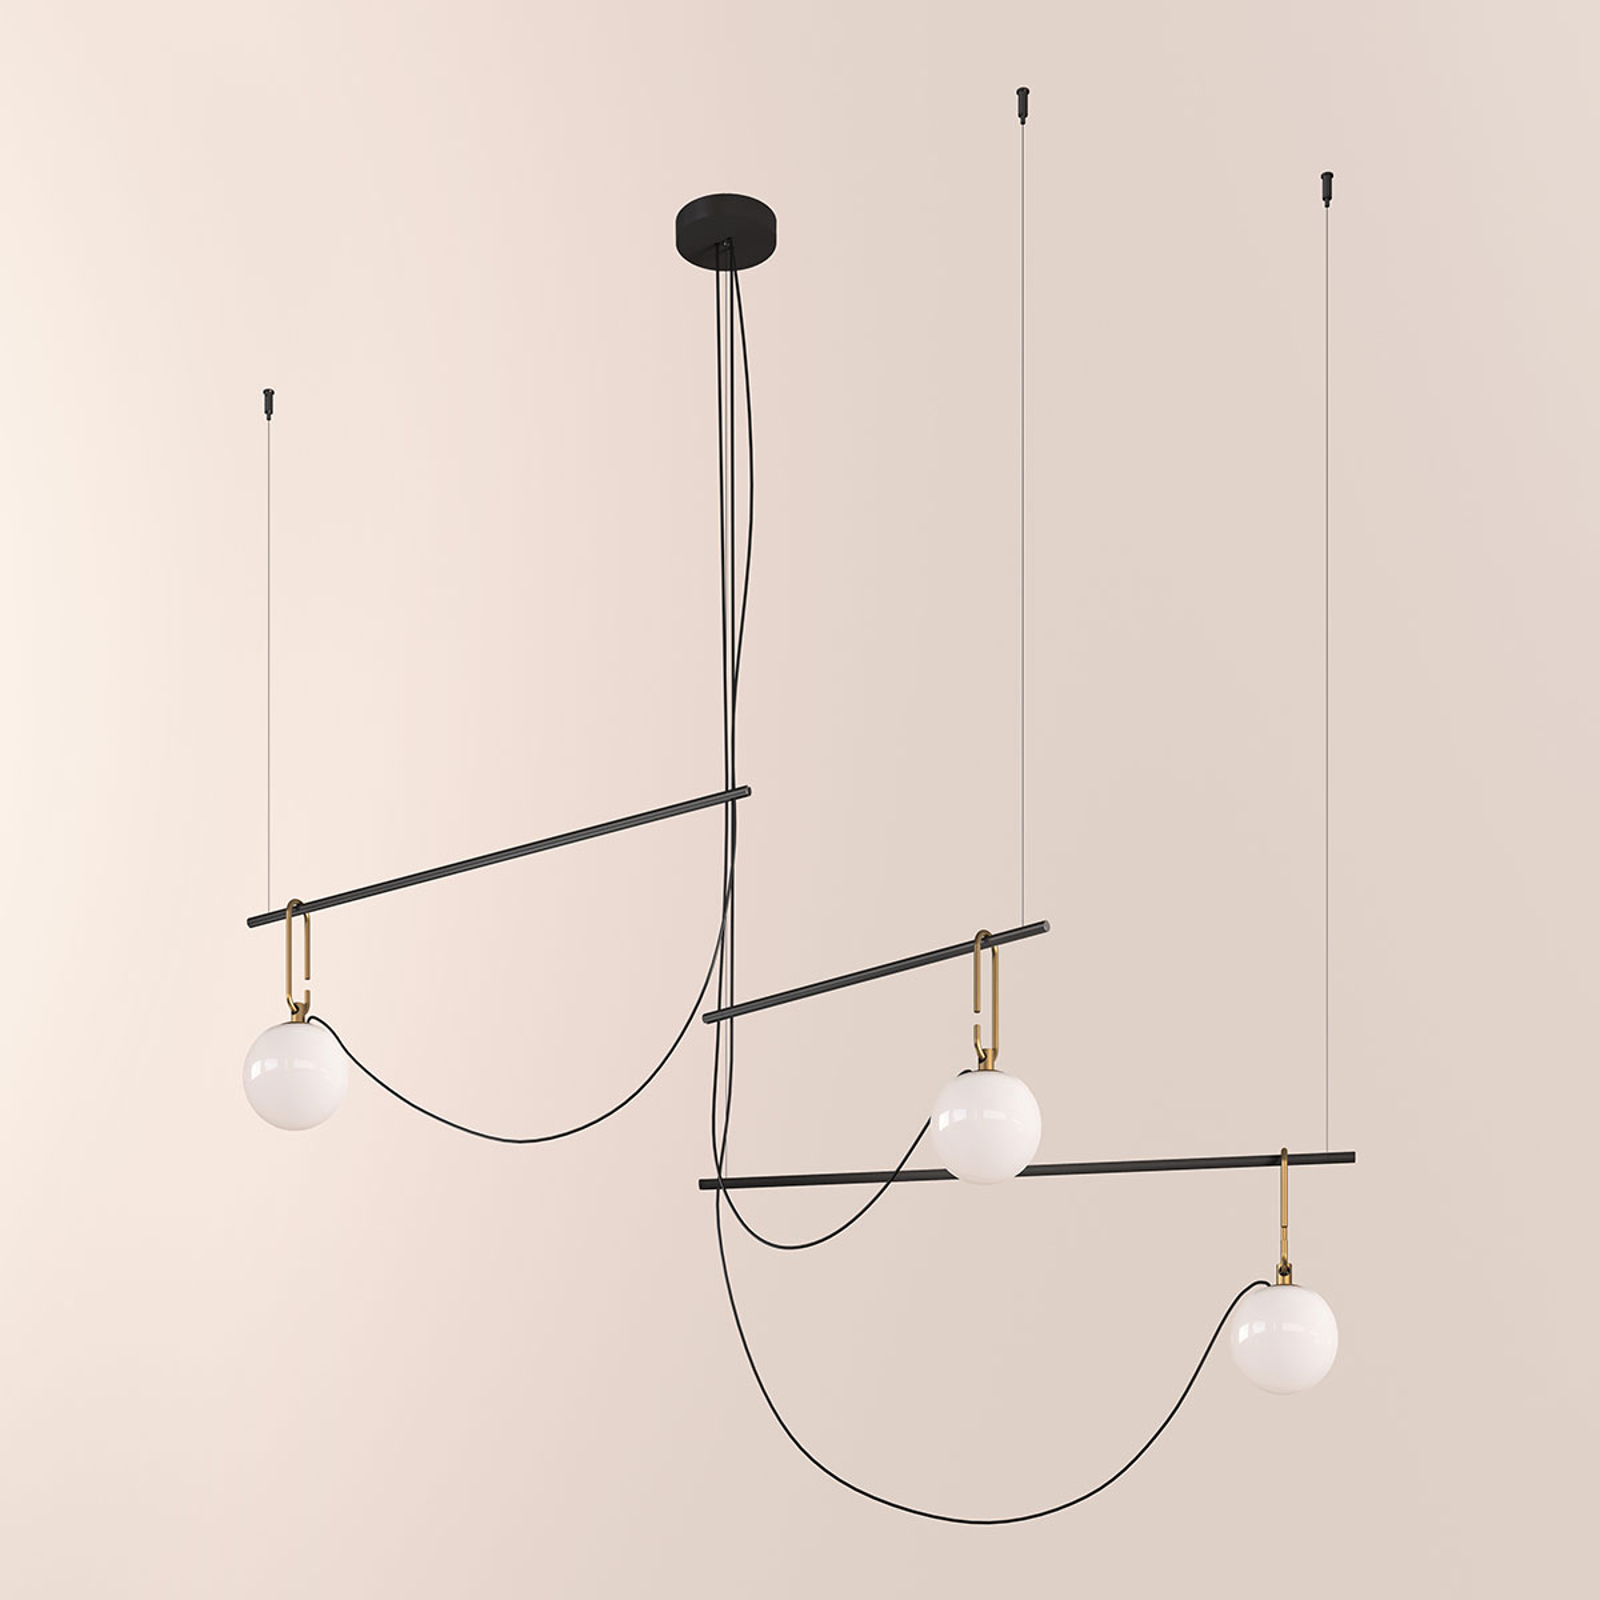 Artemide nh S3 14 suspension, 3lampes